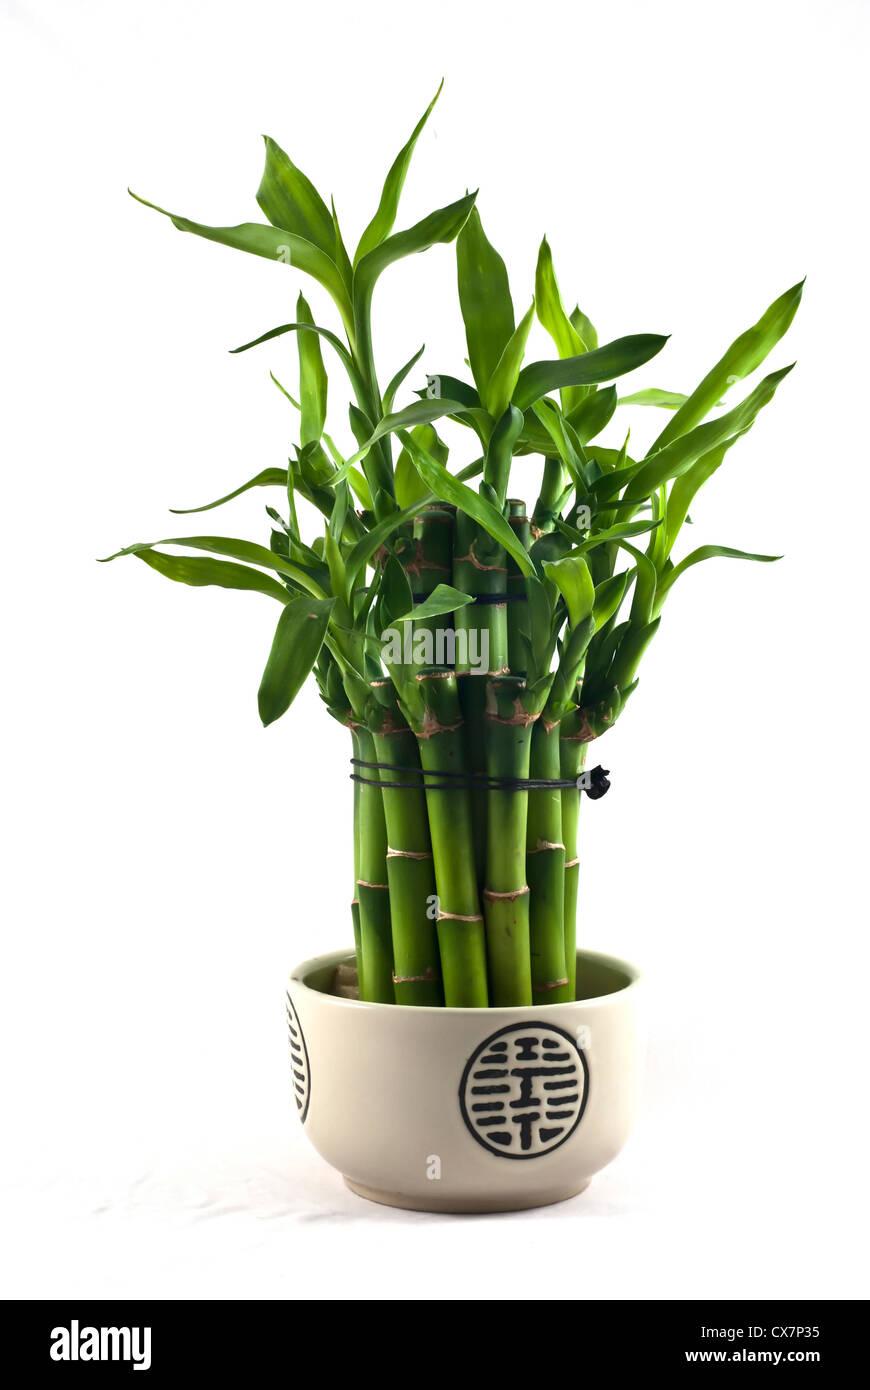 Lucky bamboo dracaena sanderiana in a porcelain pot stock photo lucky bamboo dracaena sanderiana in a porcelain pot reviewsmspy